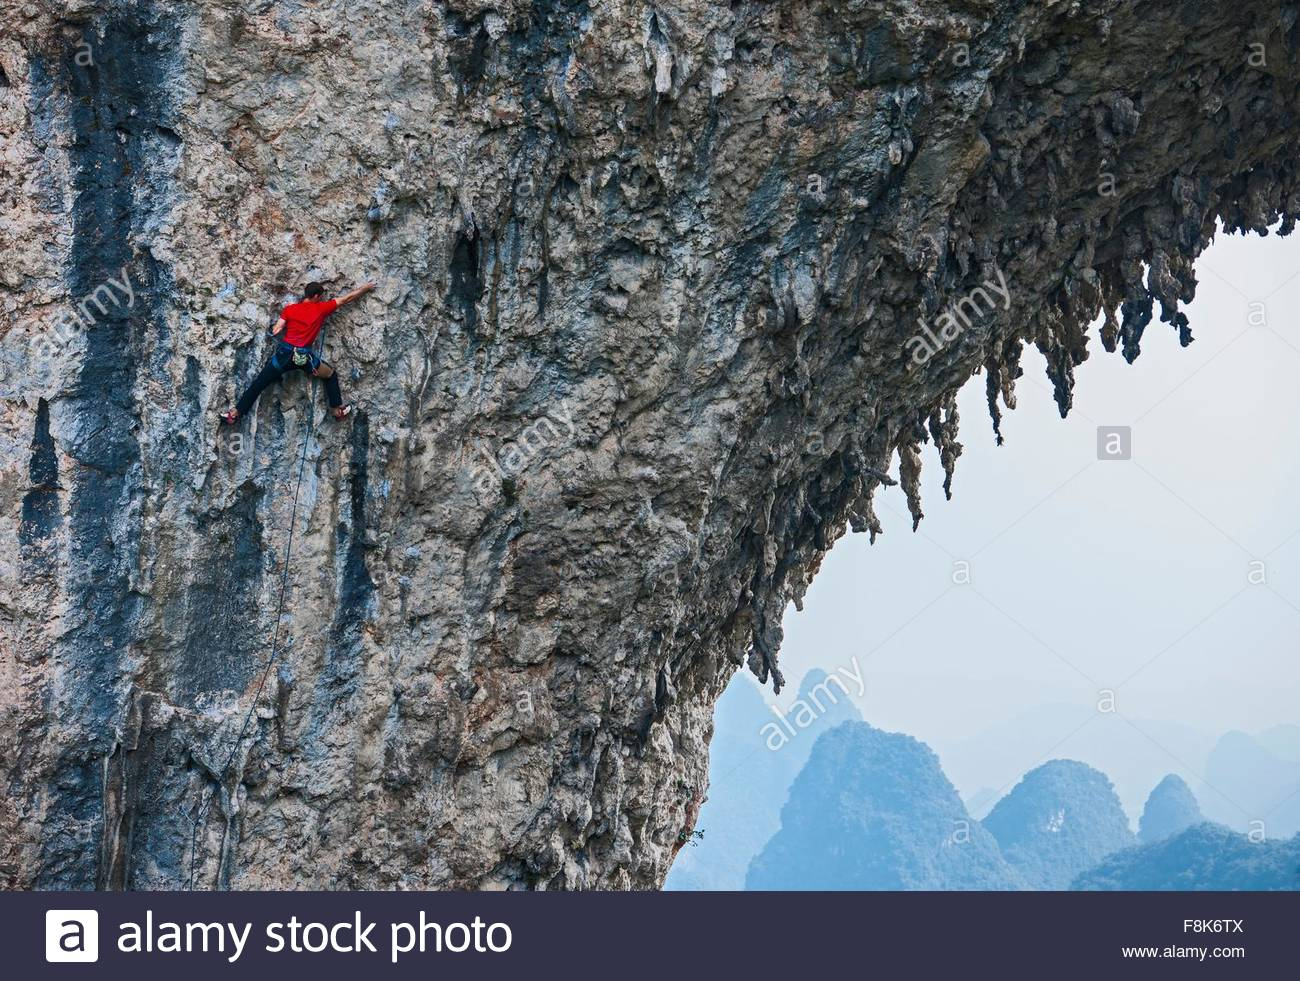 Männliche Kletterer Klettern auf Moon Hill - ein Kalksteinfelsen in Yangshuo, Guangxi Zhuang, China Stockbild